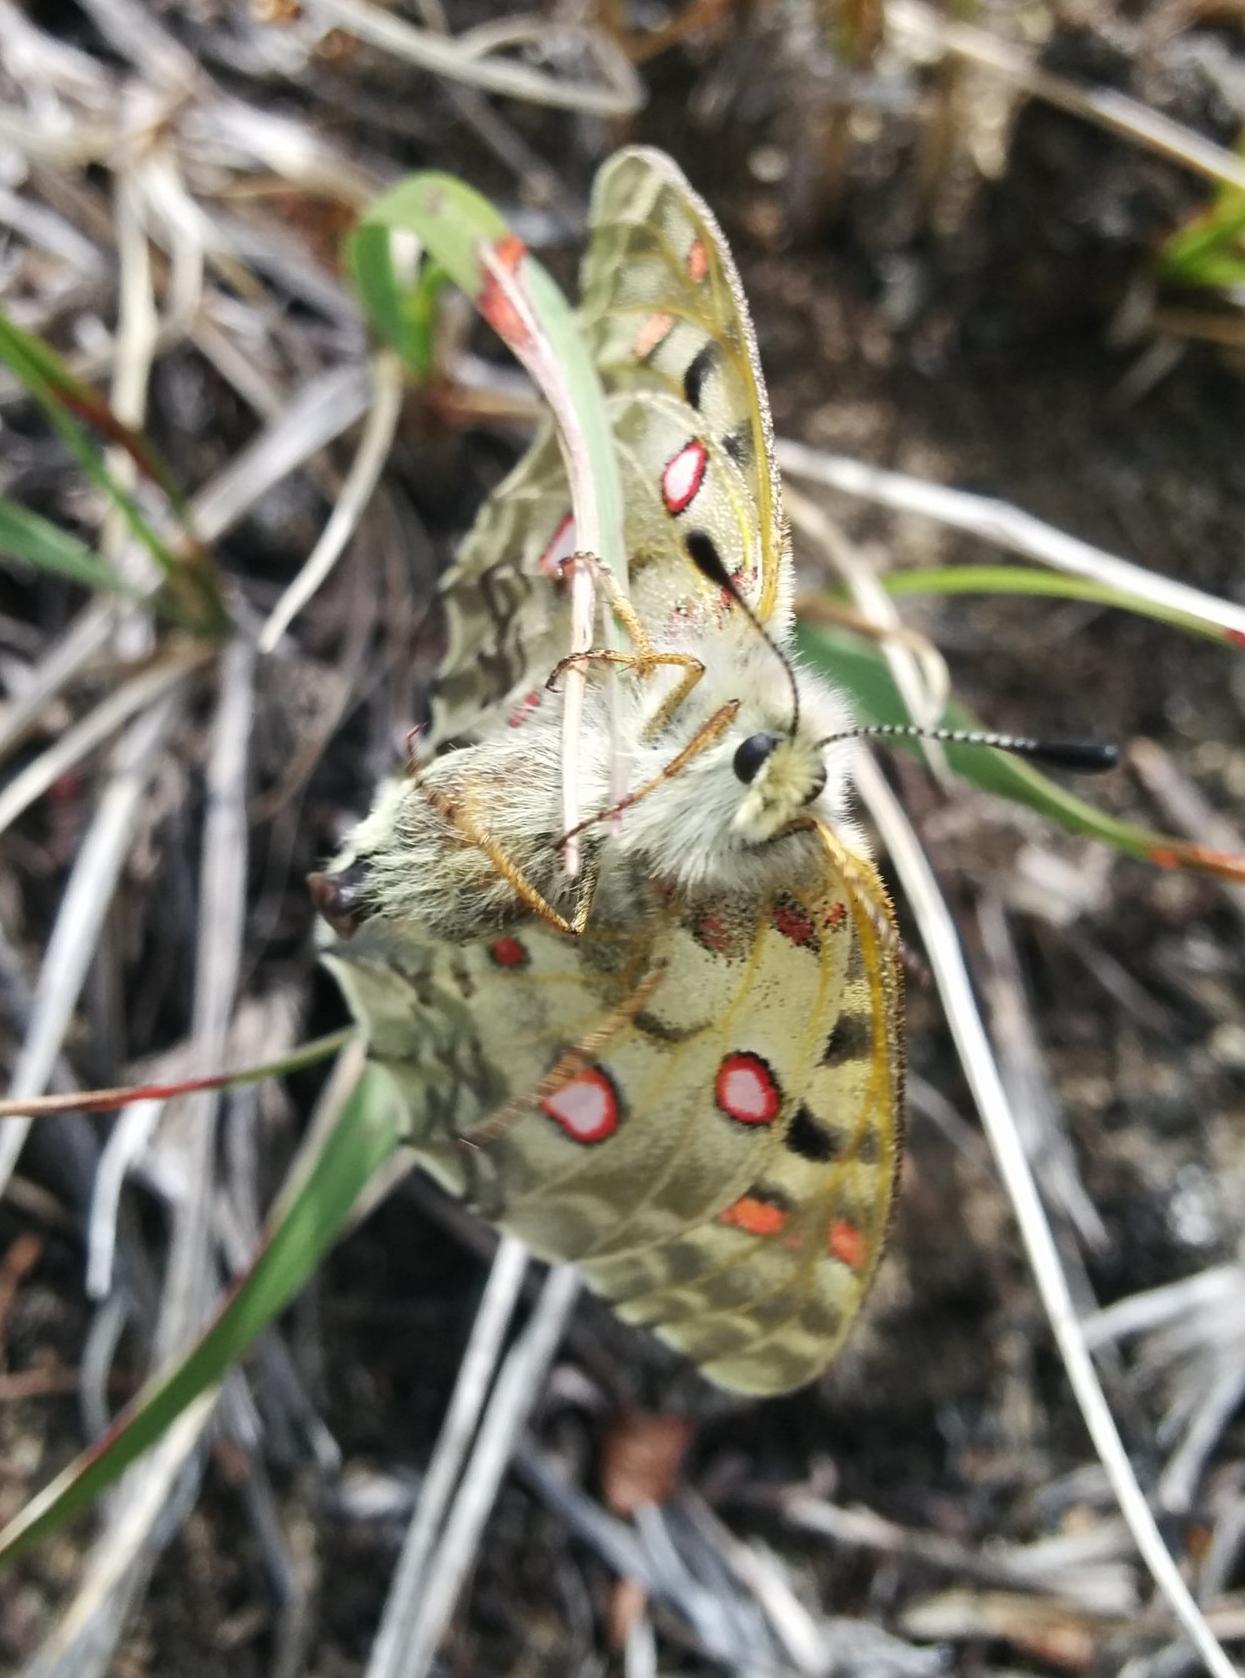 Female P. smintheus